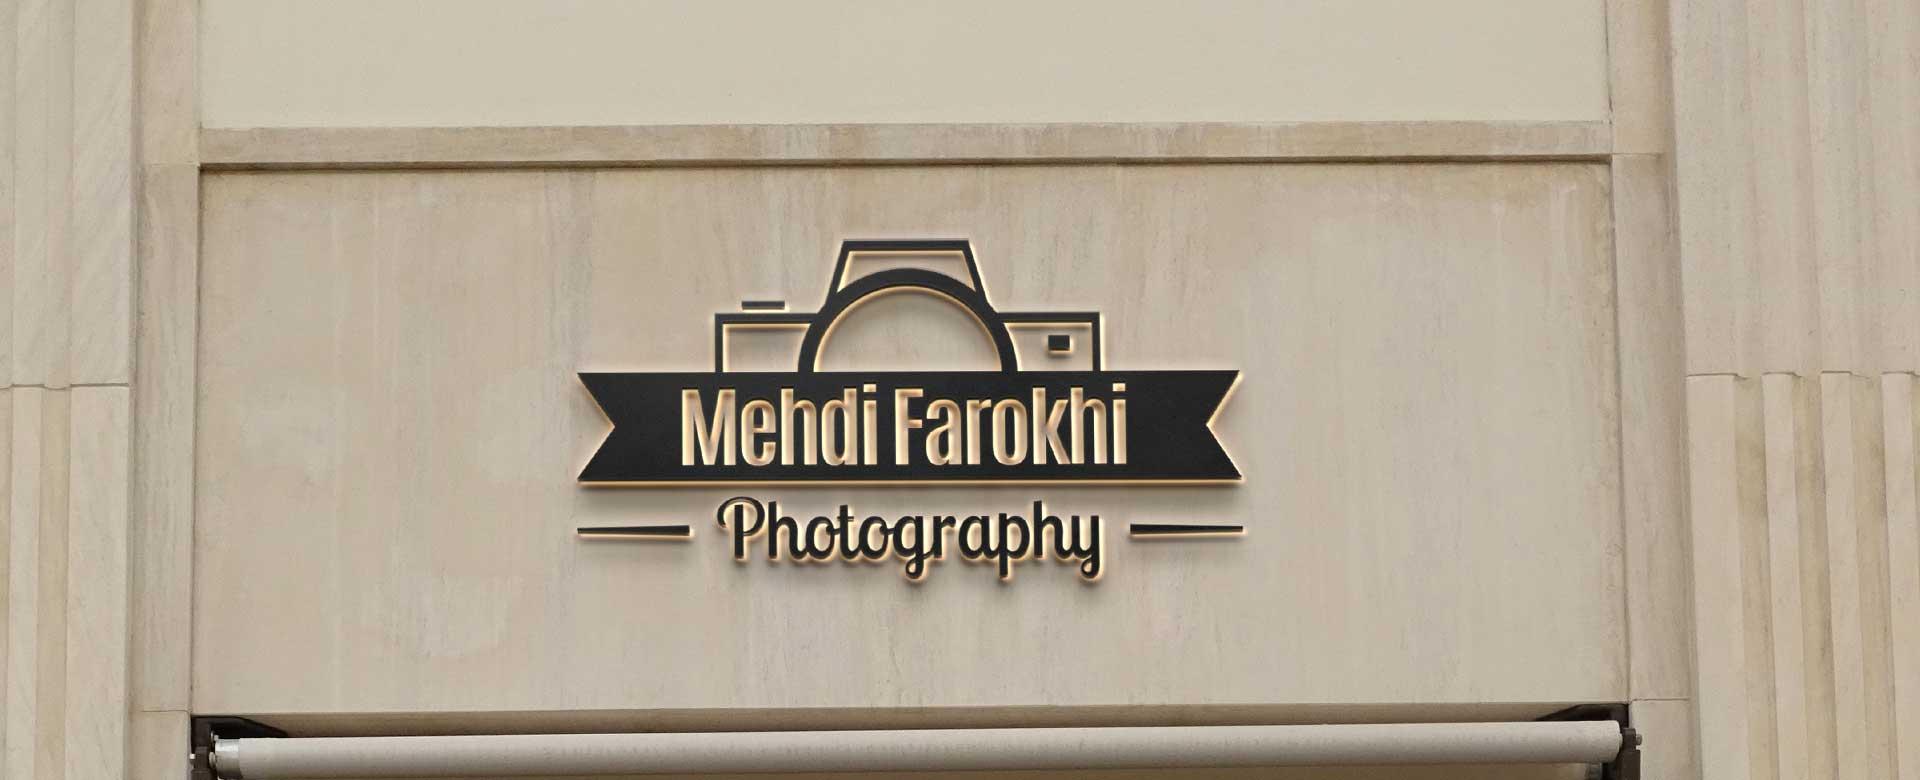 mehdi-farokhi-banner